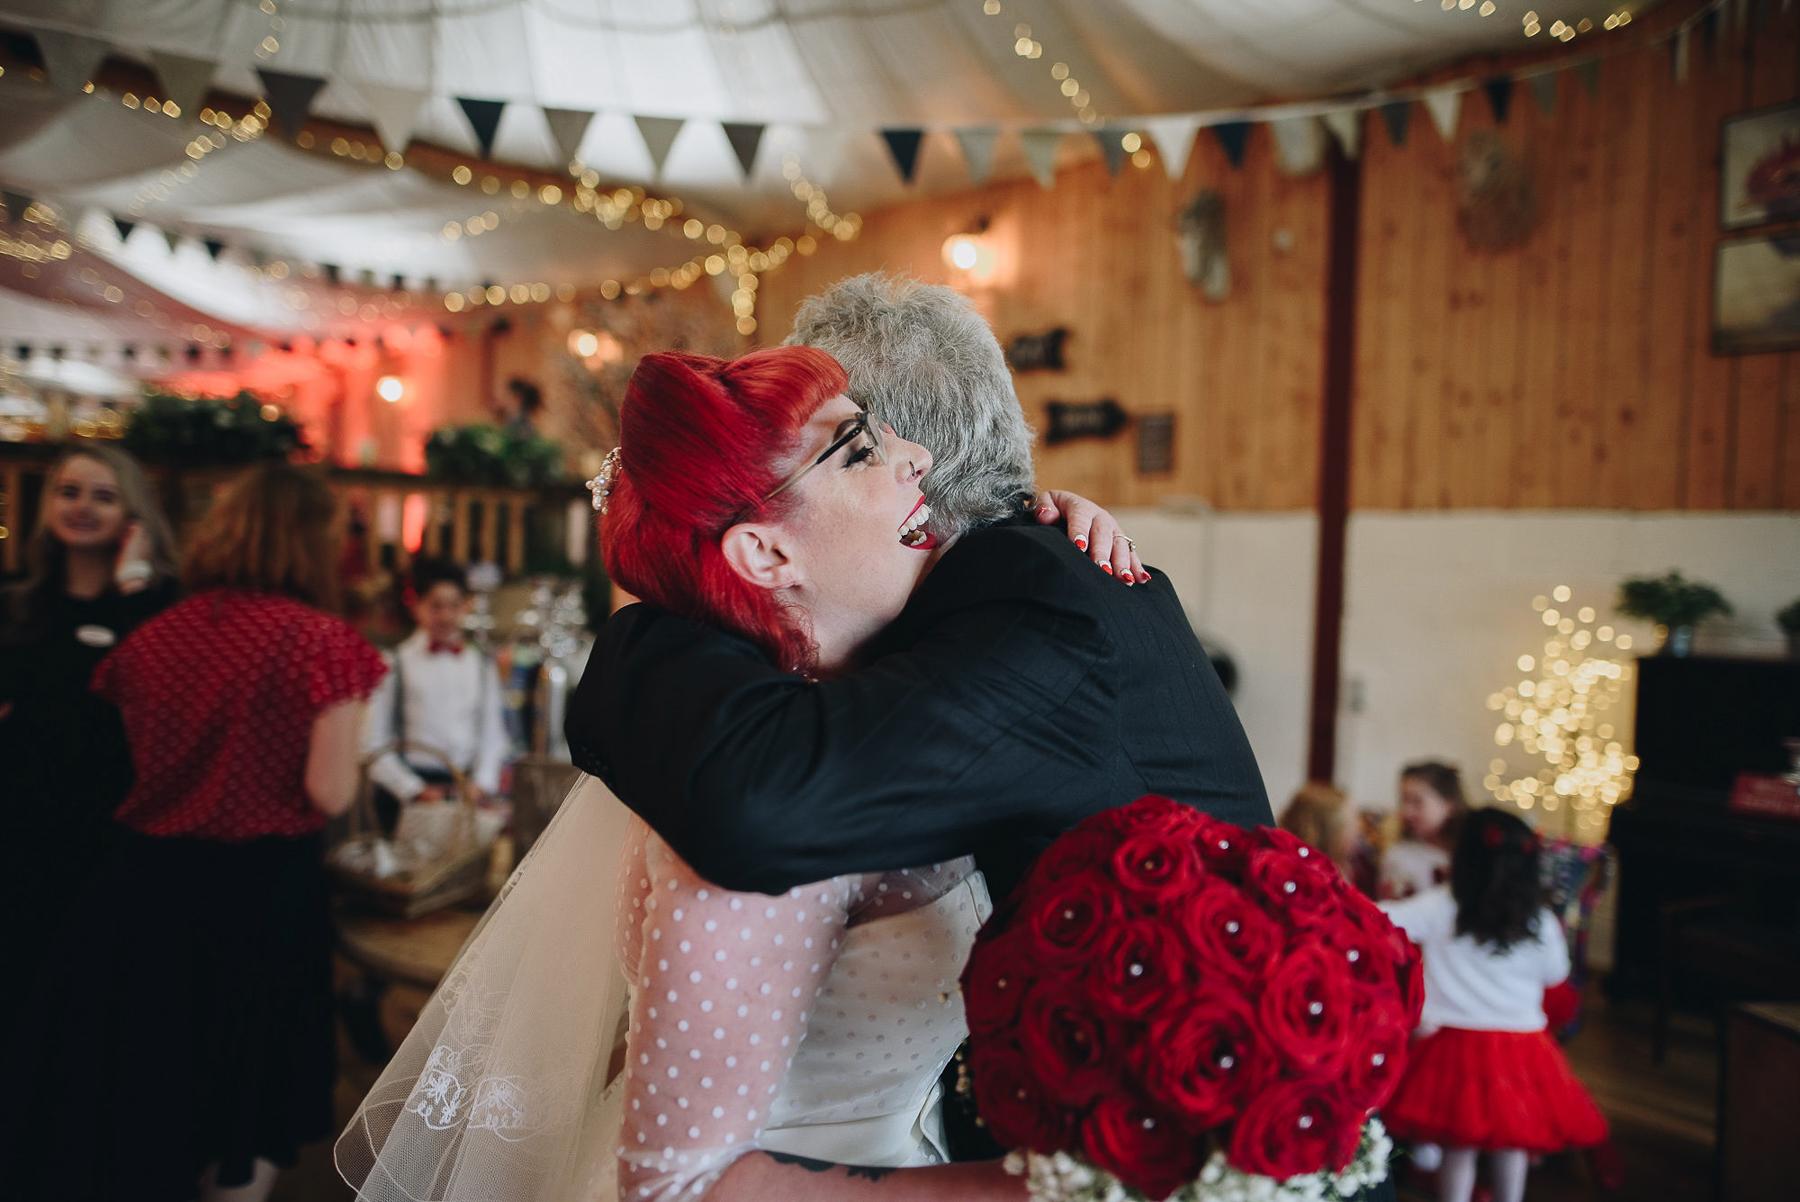 Wellbeing_Farm_Wedding_Photography_The_Pin-Up_Bride_Lara_Shaun-46.jpg